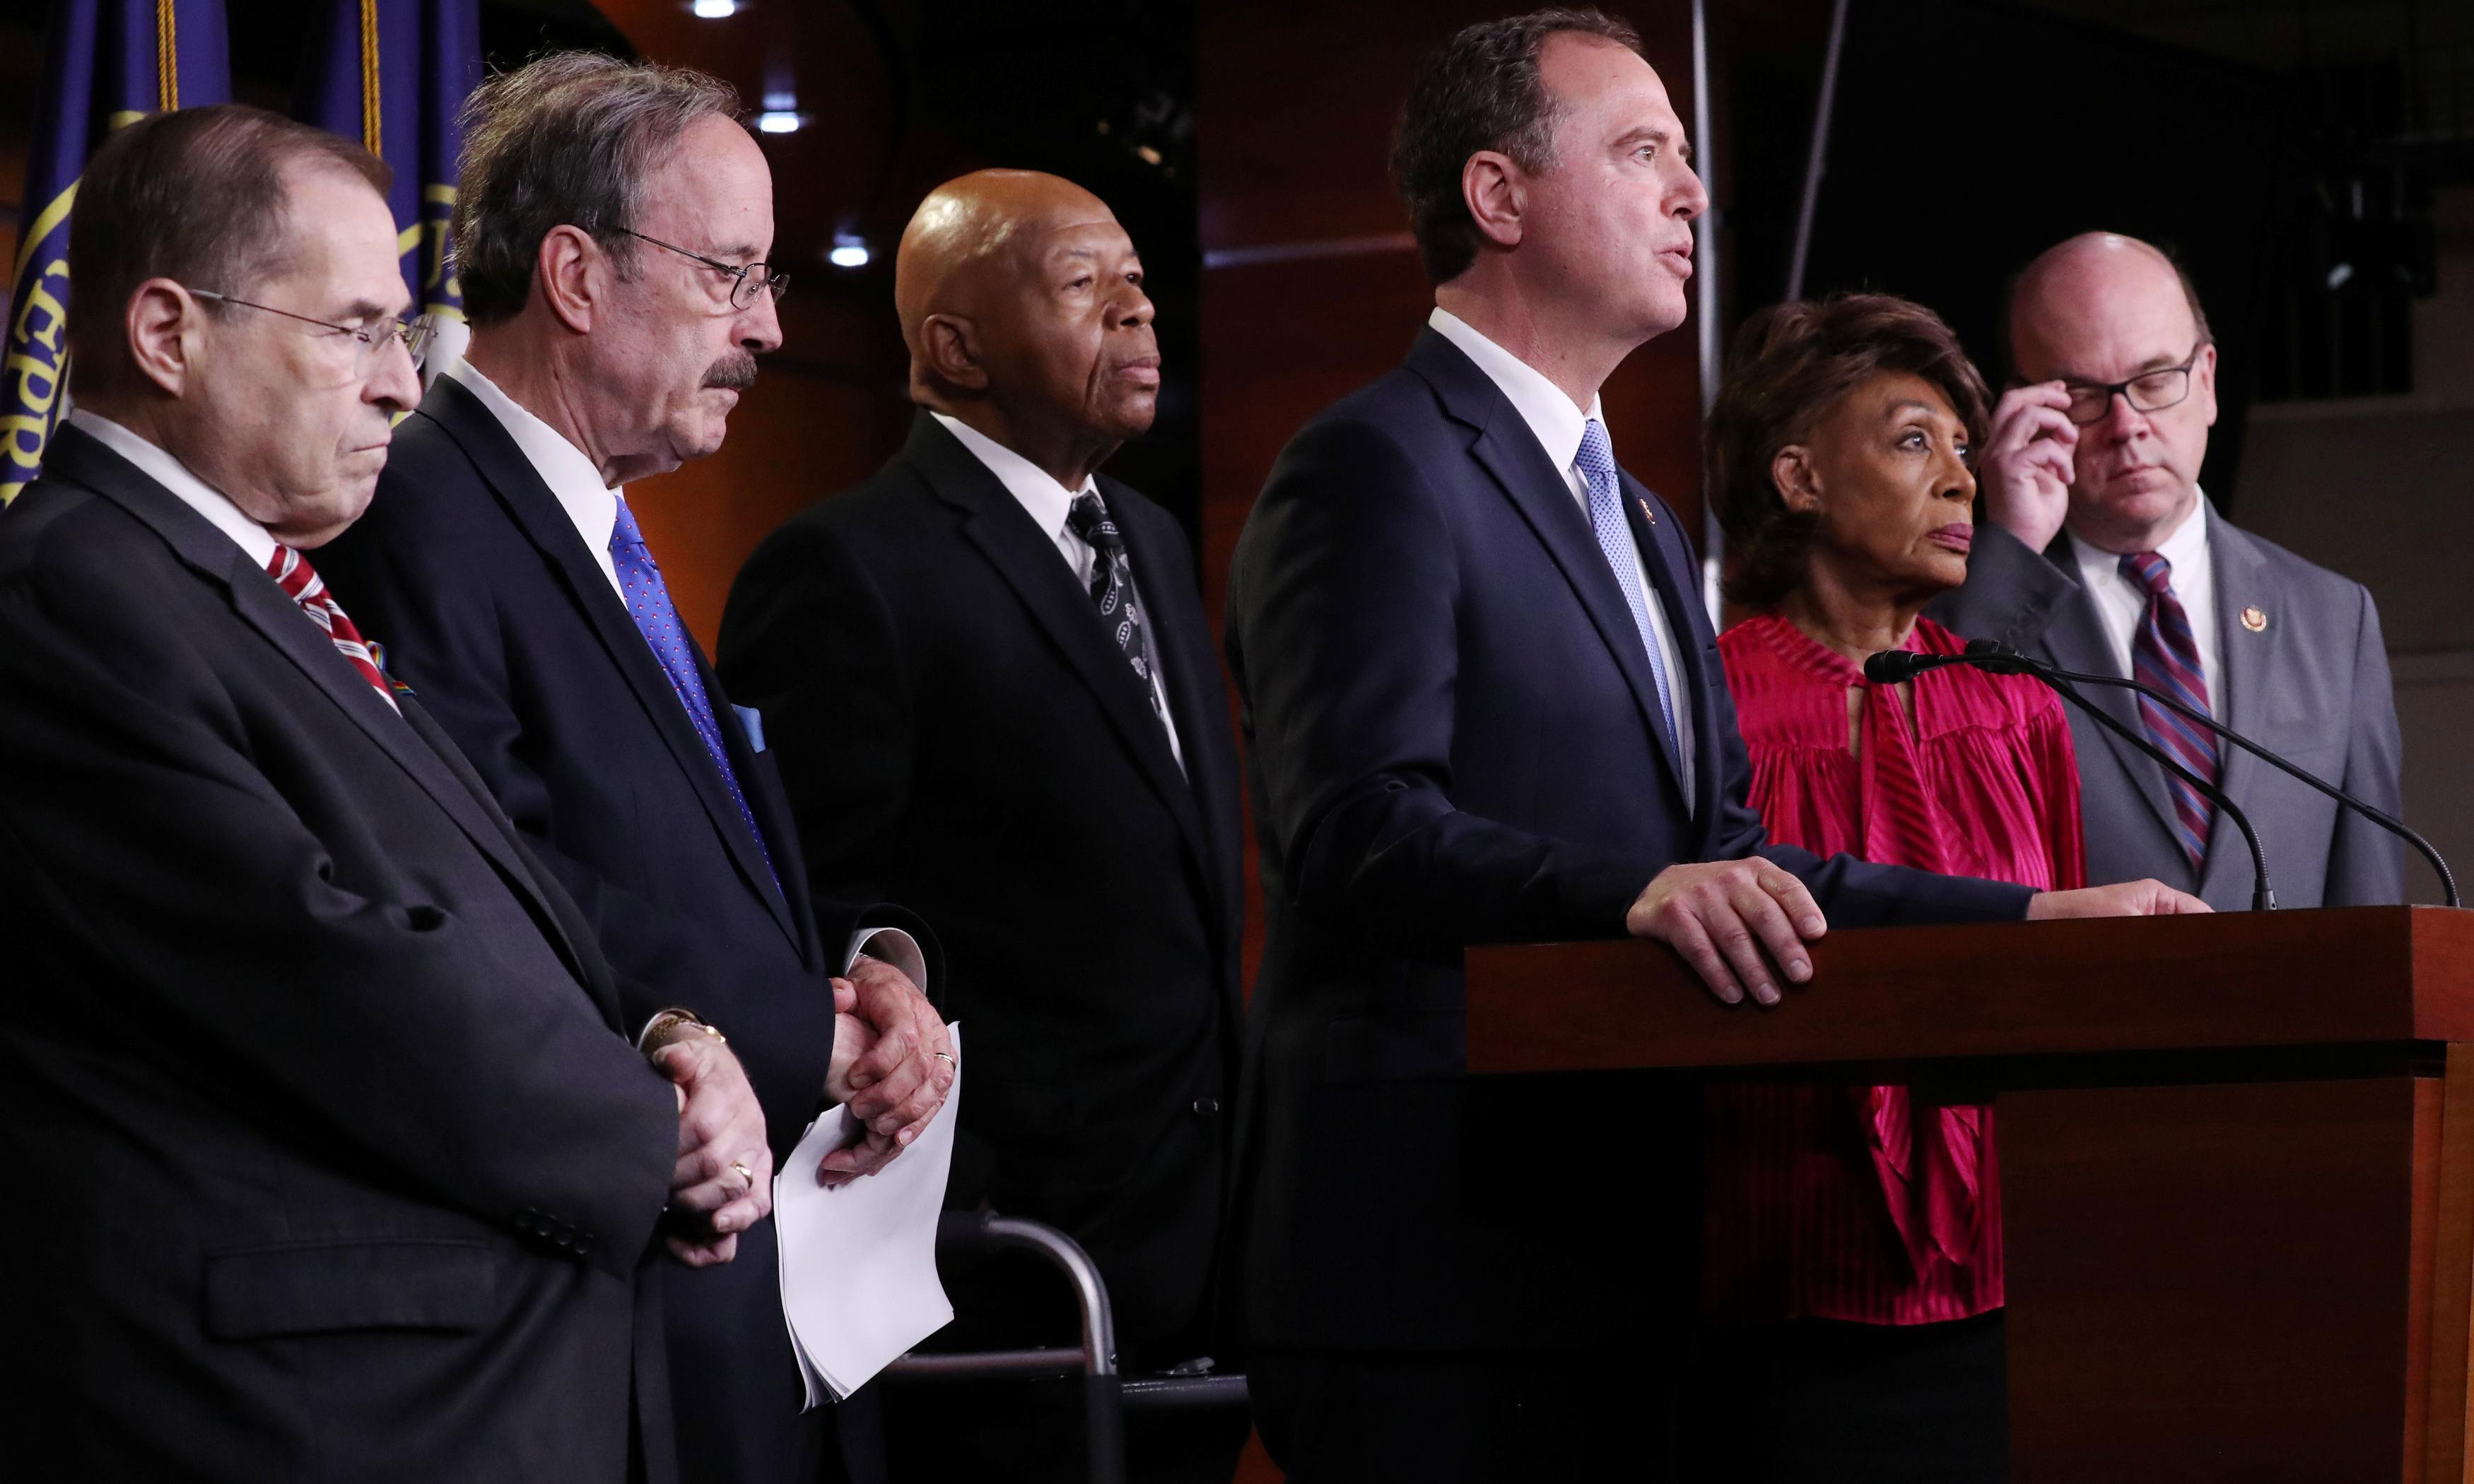 House moves to enforce subpoenas against Barr and McGahn